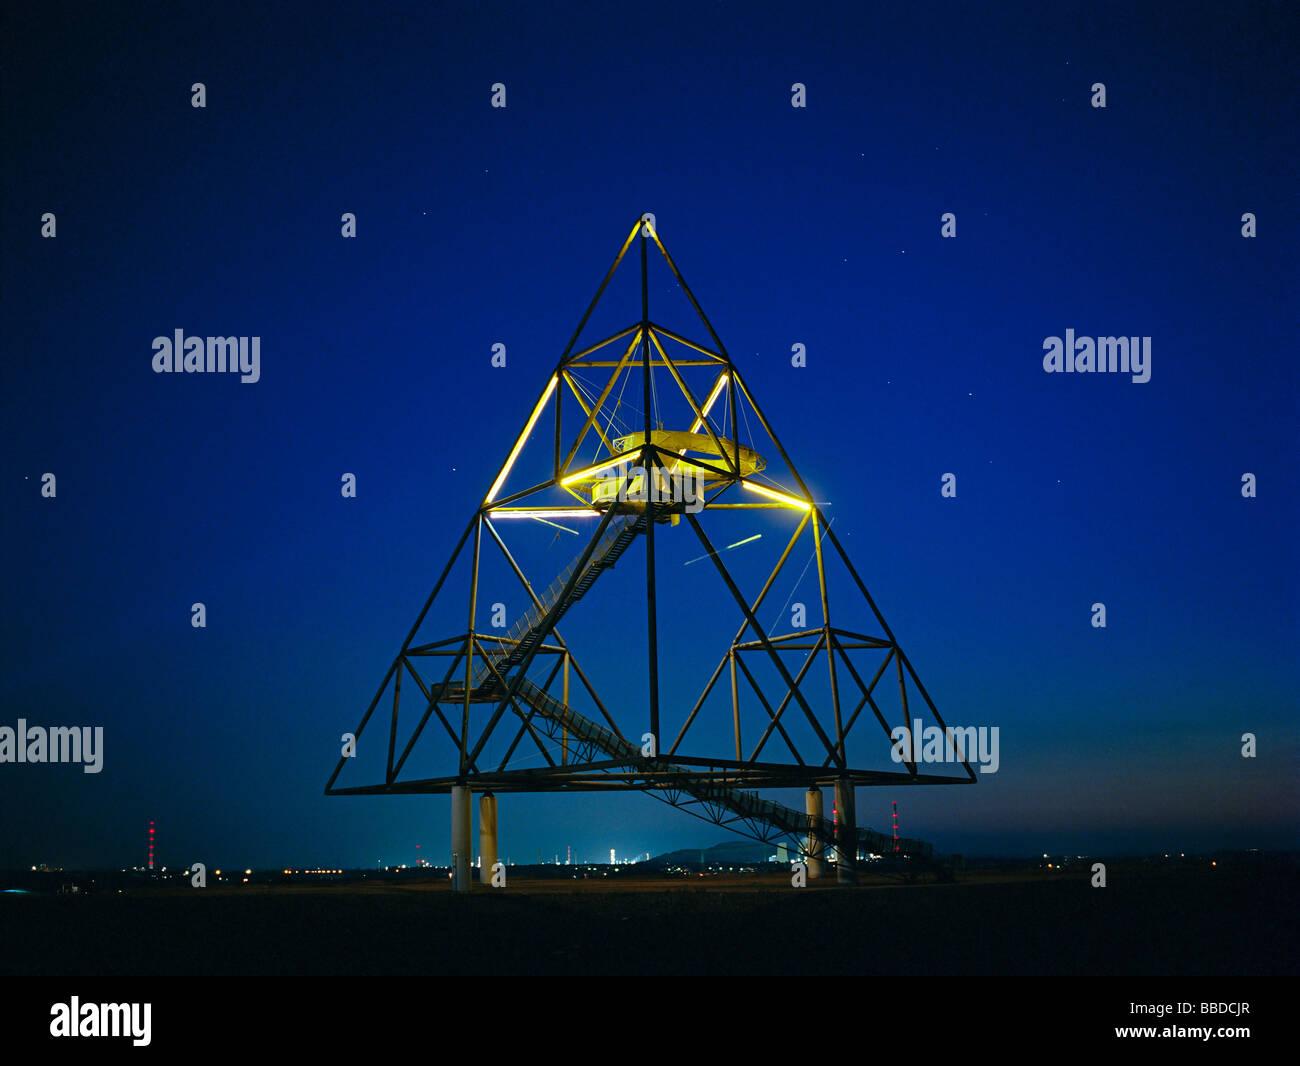 "landmark ""tetrahedron"" illuminated at night on the top of the mining dump Beckstrasse European Capital of Culture - Stock Image"